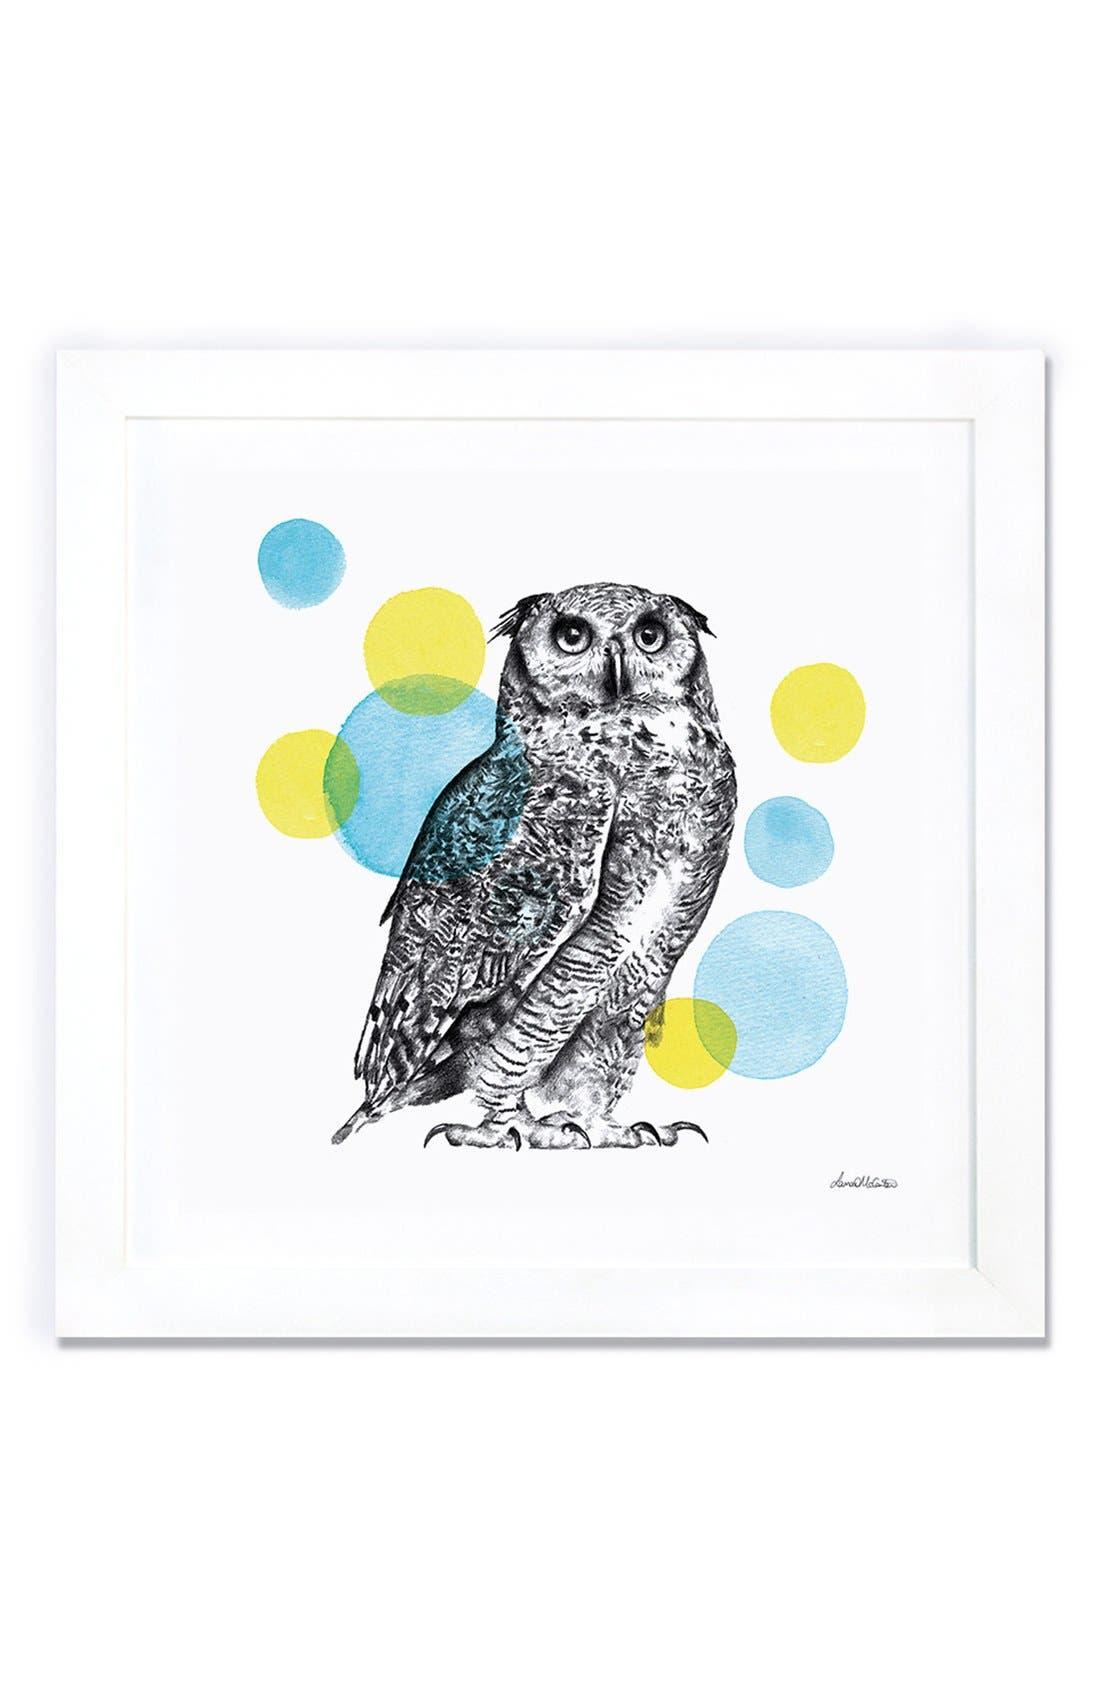 'Sketchbook - Owl' Giclée Print Framed Canvas Art,                             Main thumbnail 1, color,                             White